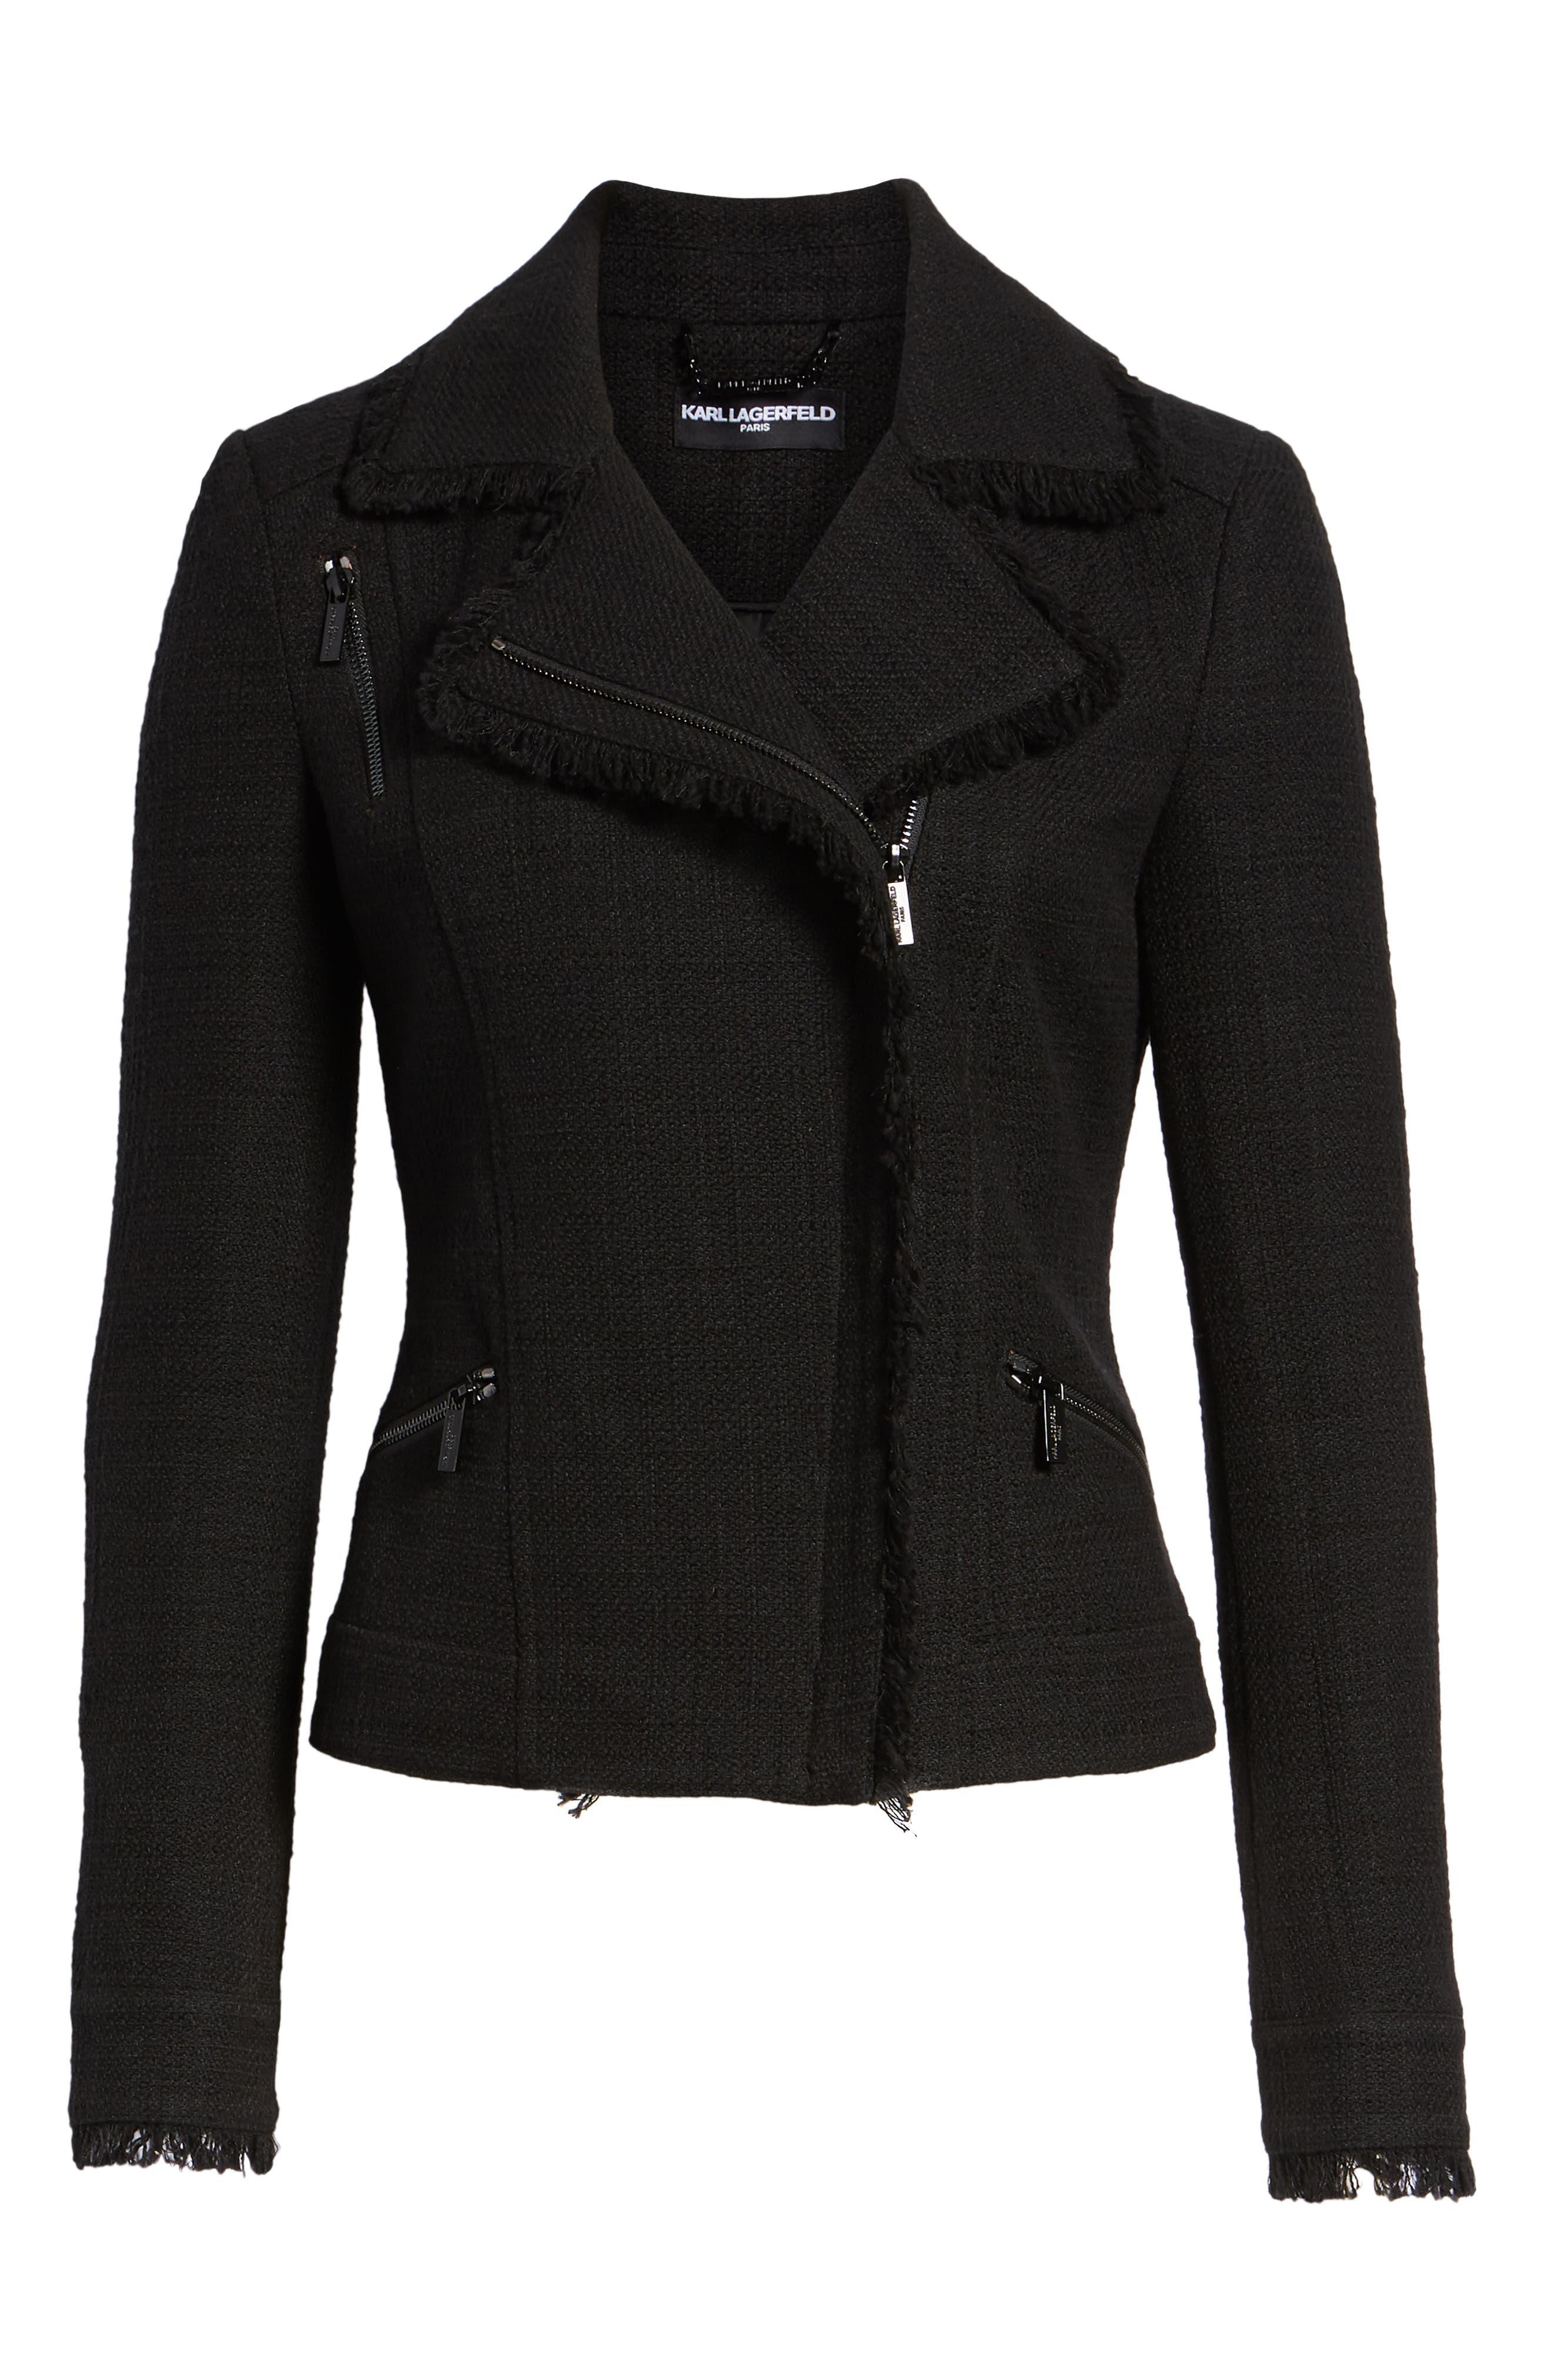 KARL LAGERFELD PARIS,                             Tweed Moto Jacket,                             Alternate thumbnail 6, color,                             001